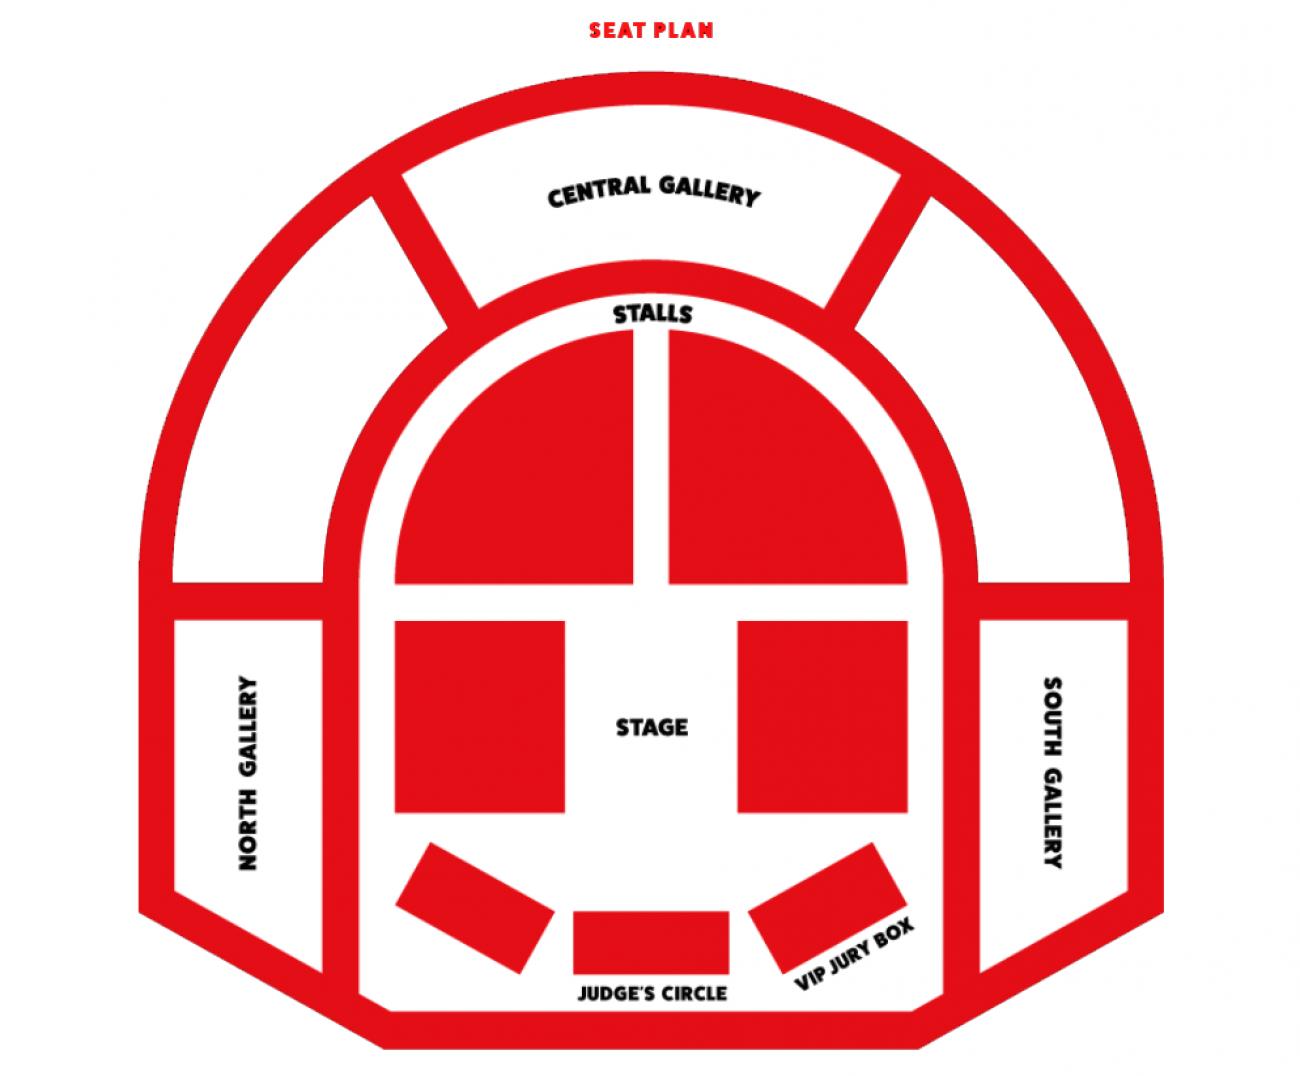 London County Hall - Plan de Salle